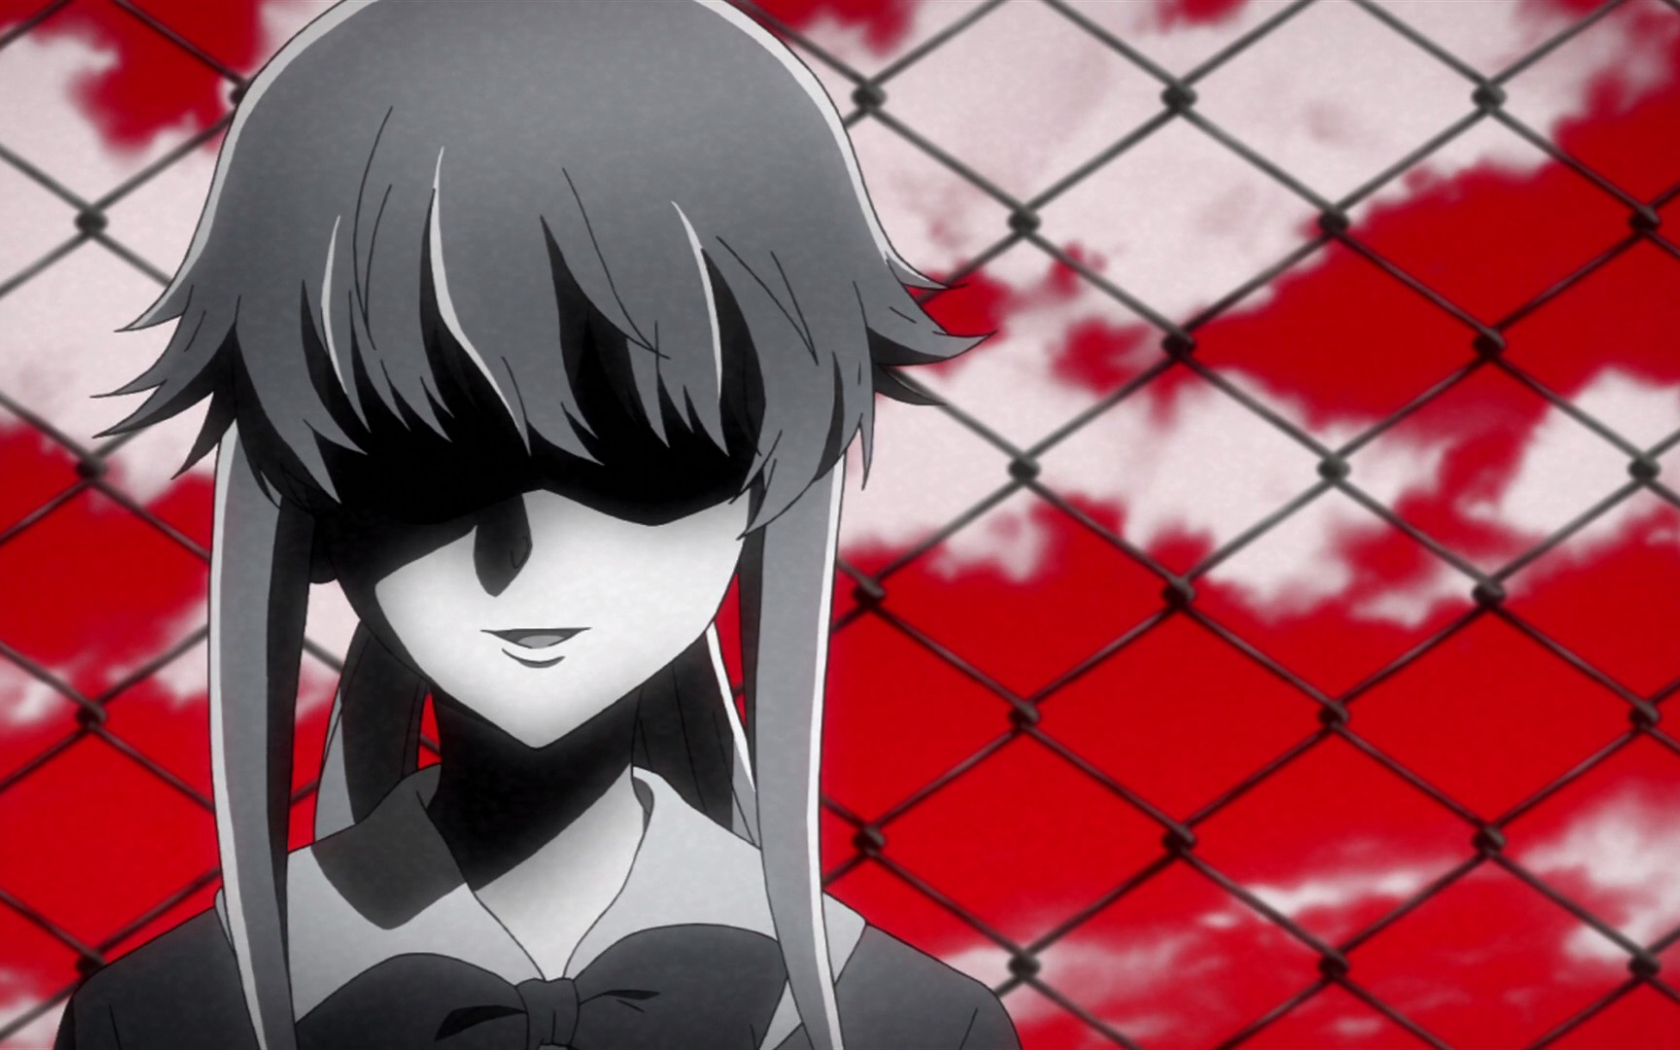 Free Download Wallpapers Hd De Anime Para Tu Pc Taringa